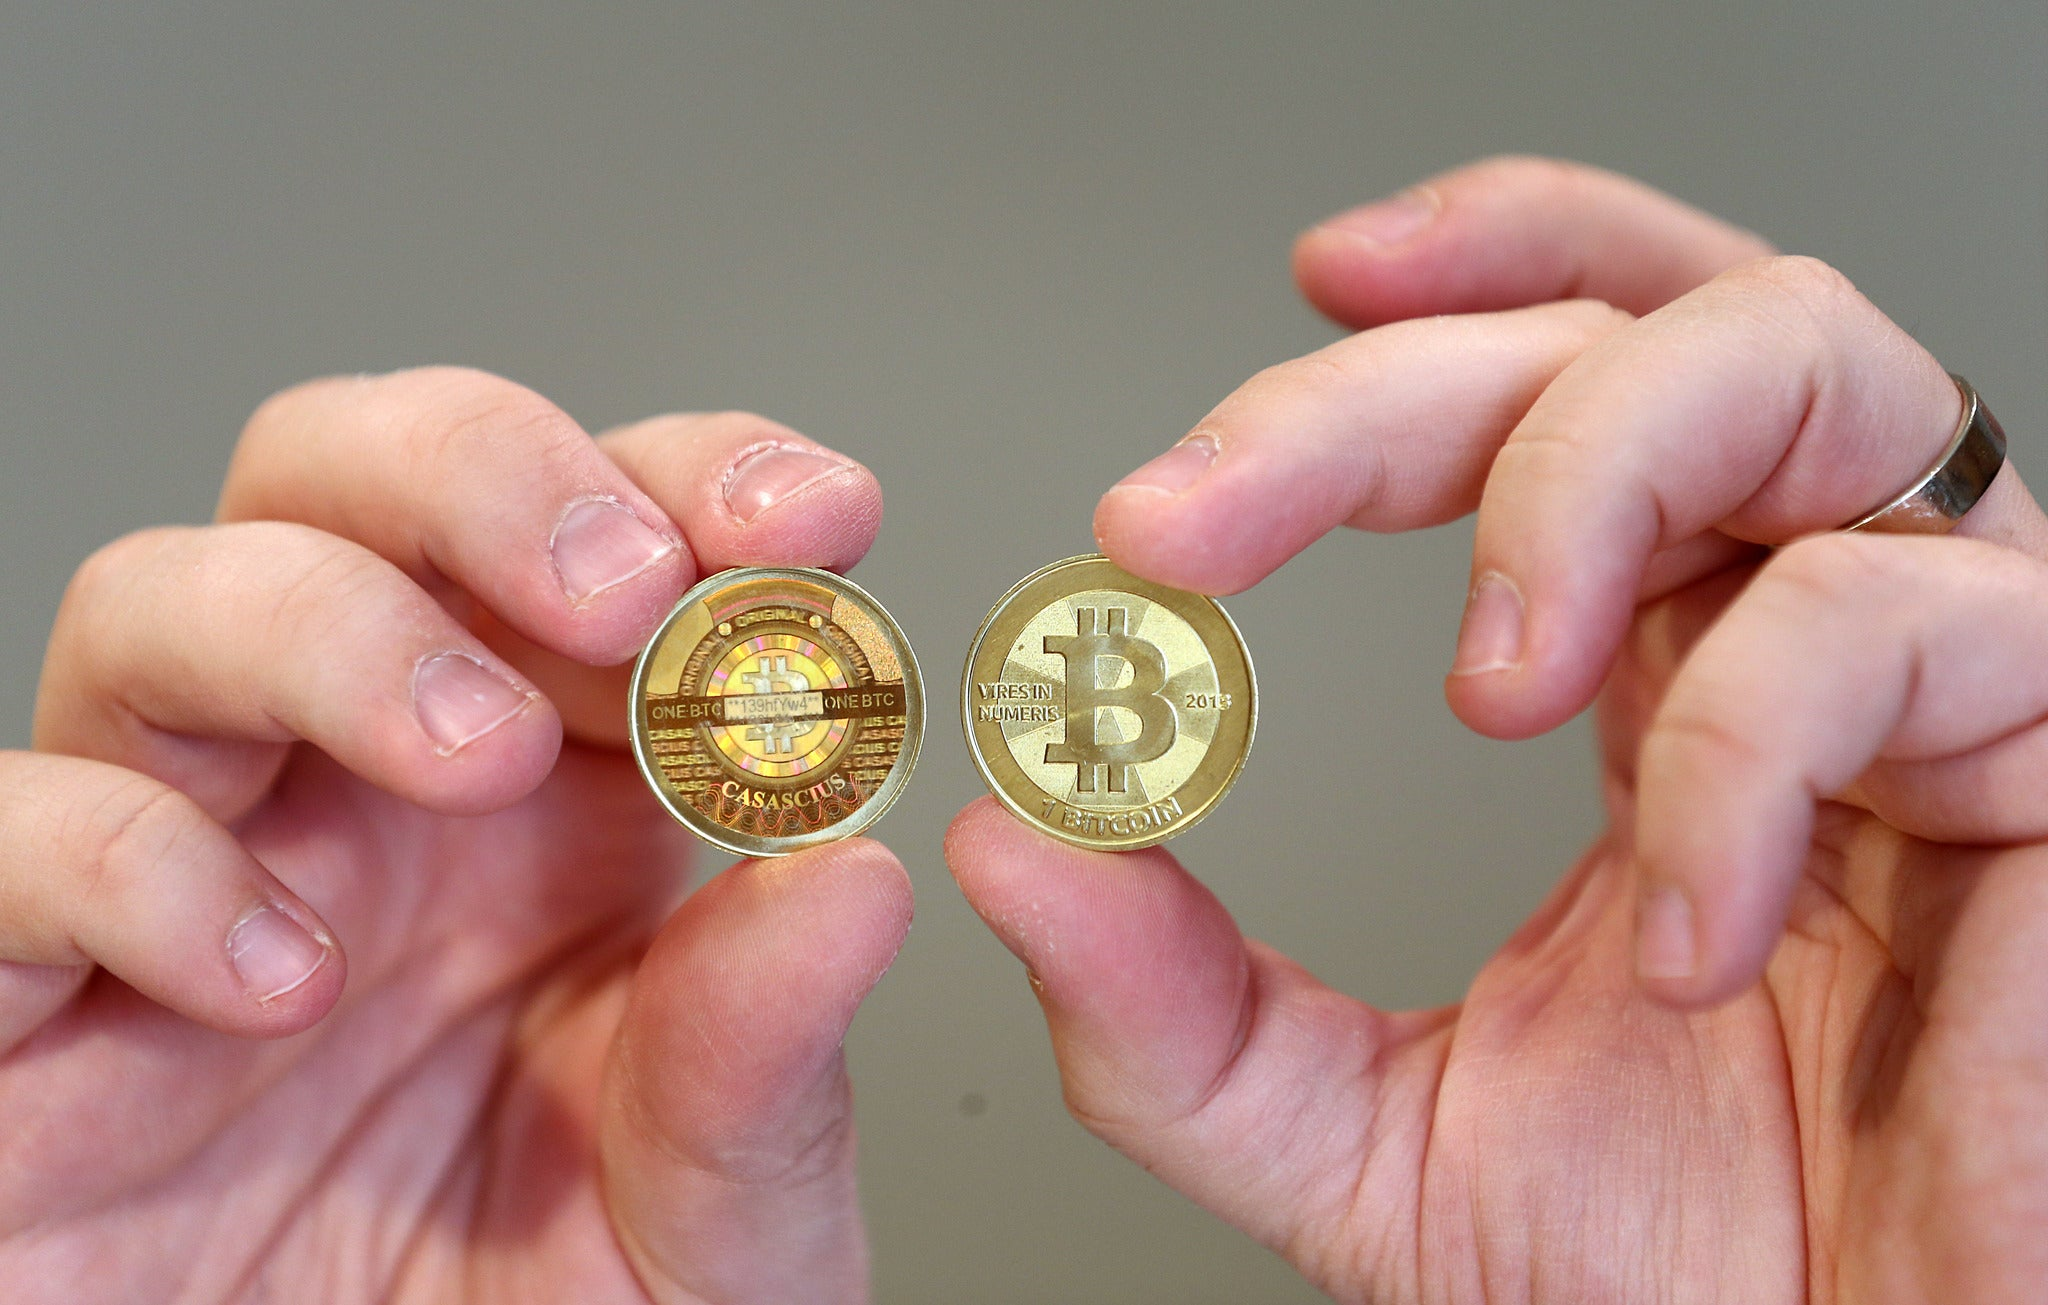 Hsgac bitcoins rafa honigstein betting